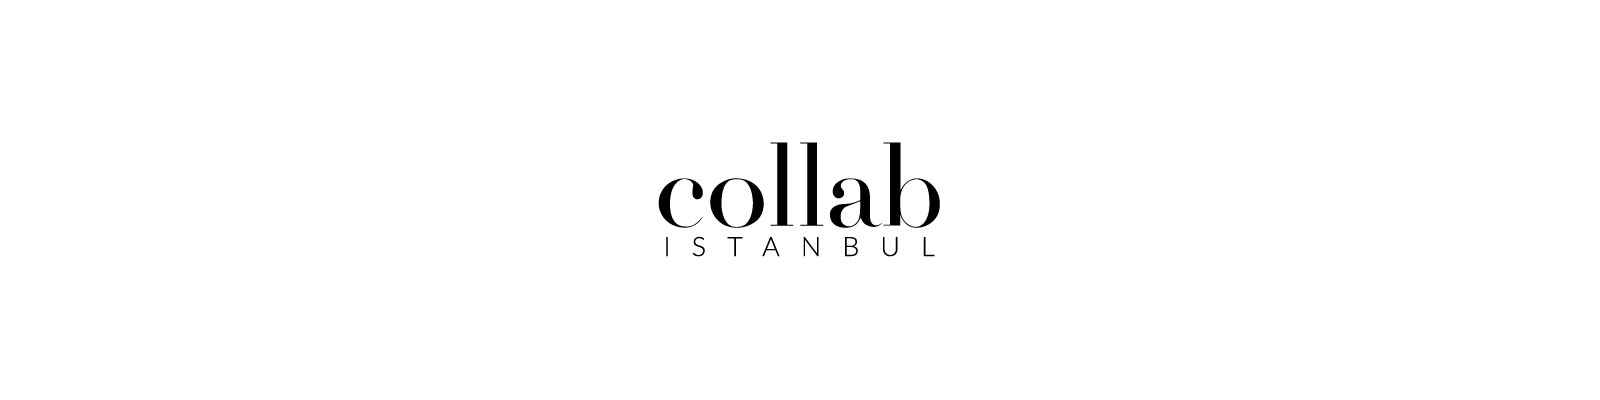 Collab Istanbul banner fotograf